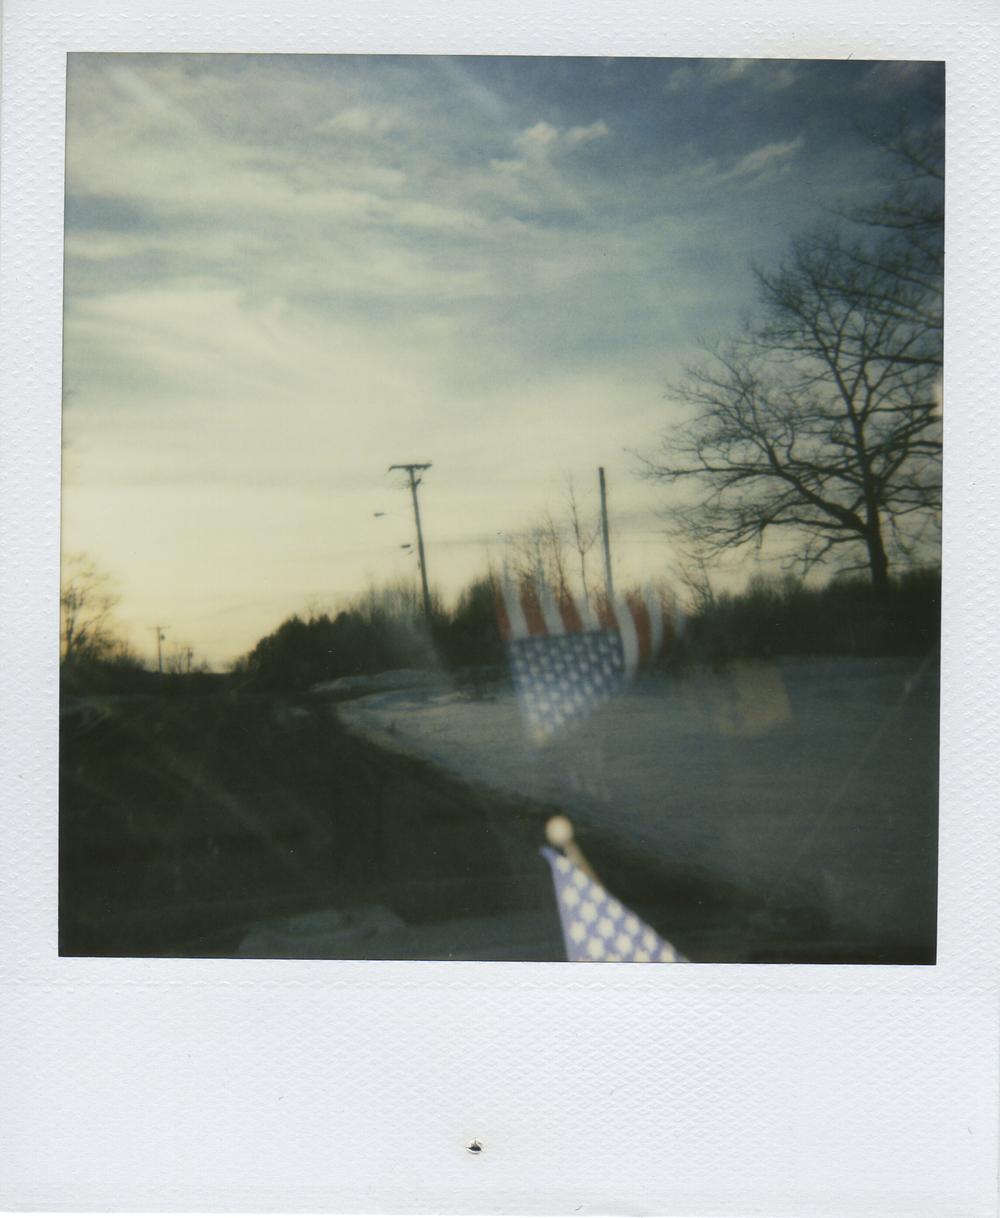 jlaurence-polaroid-138.jpg